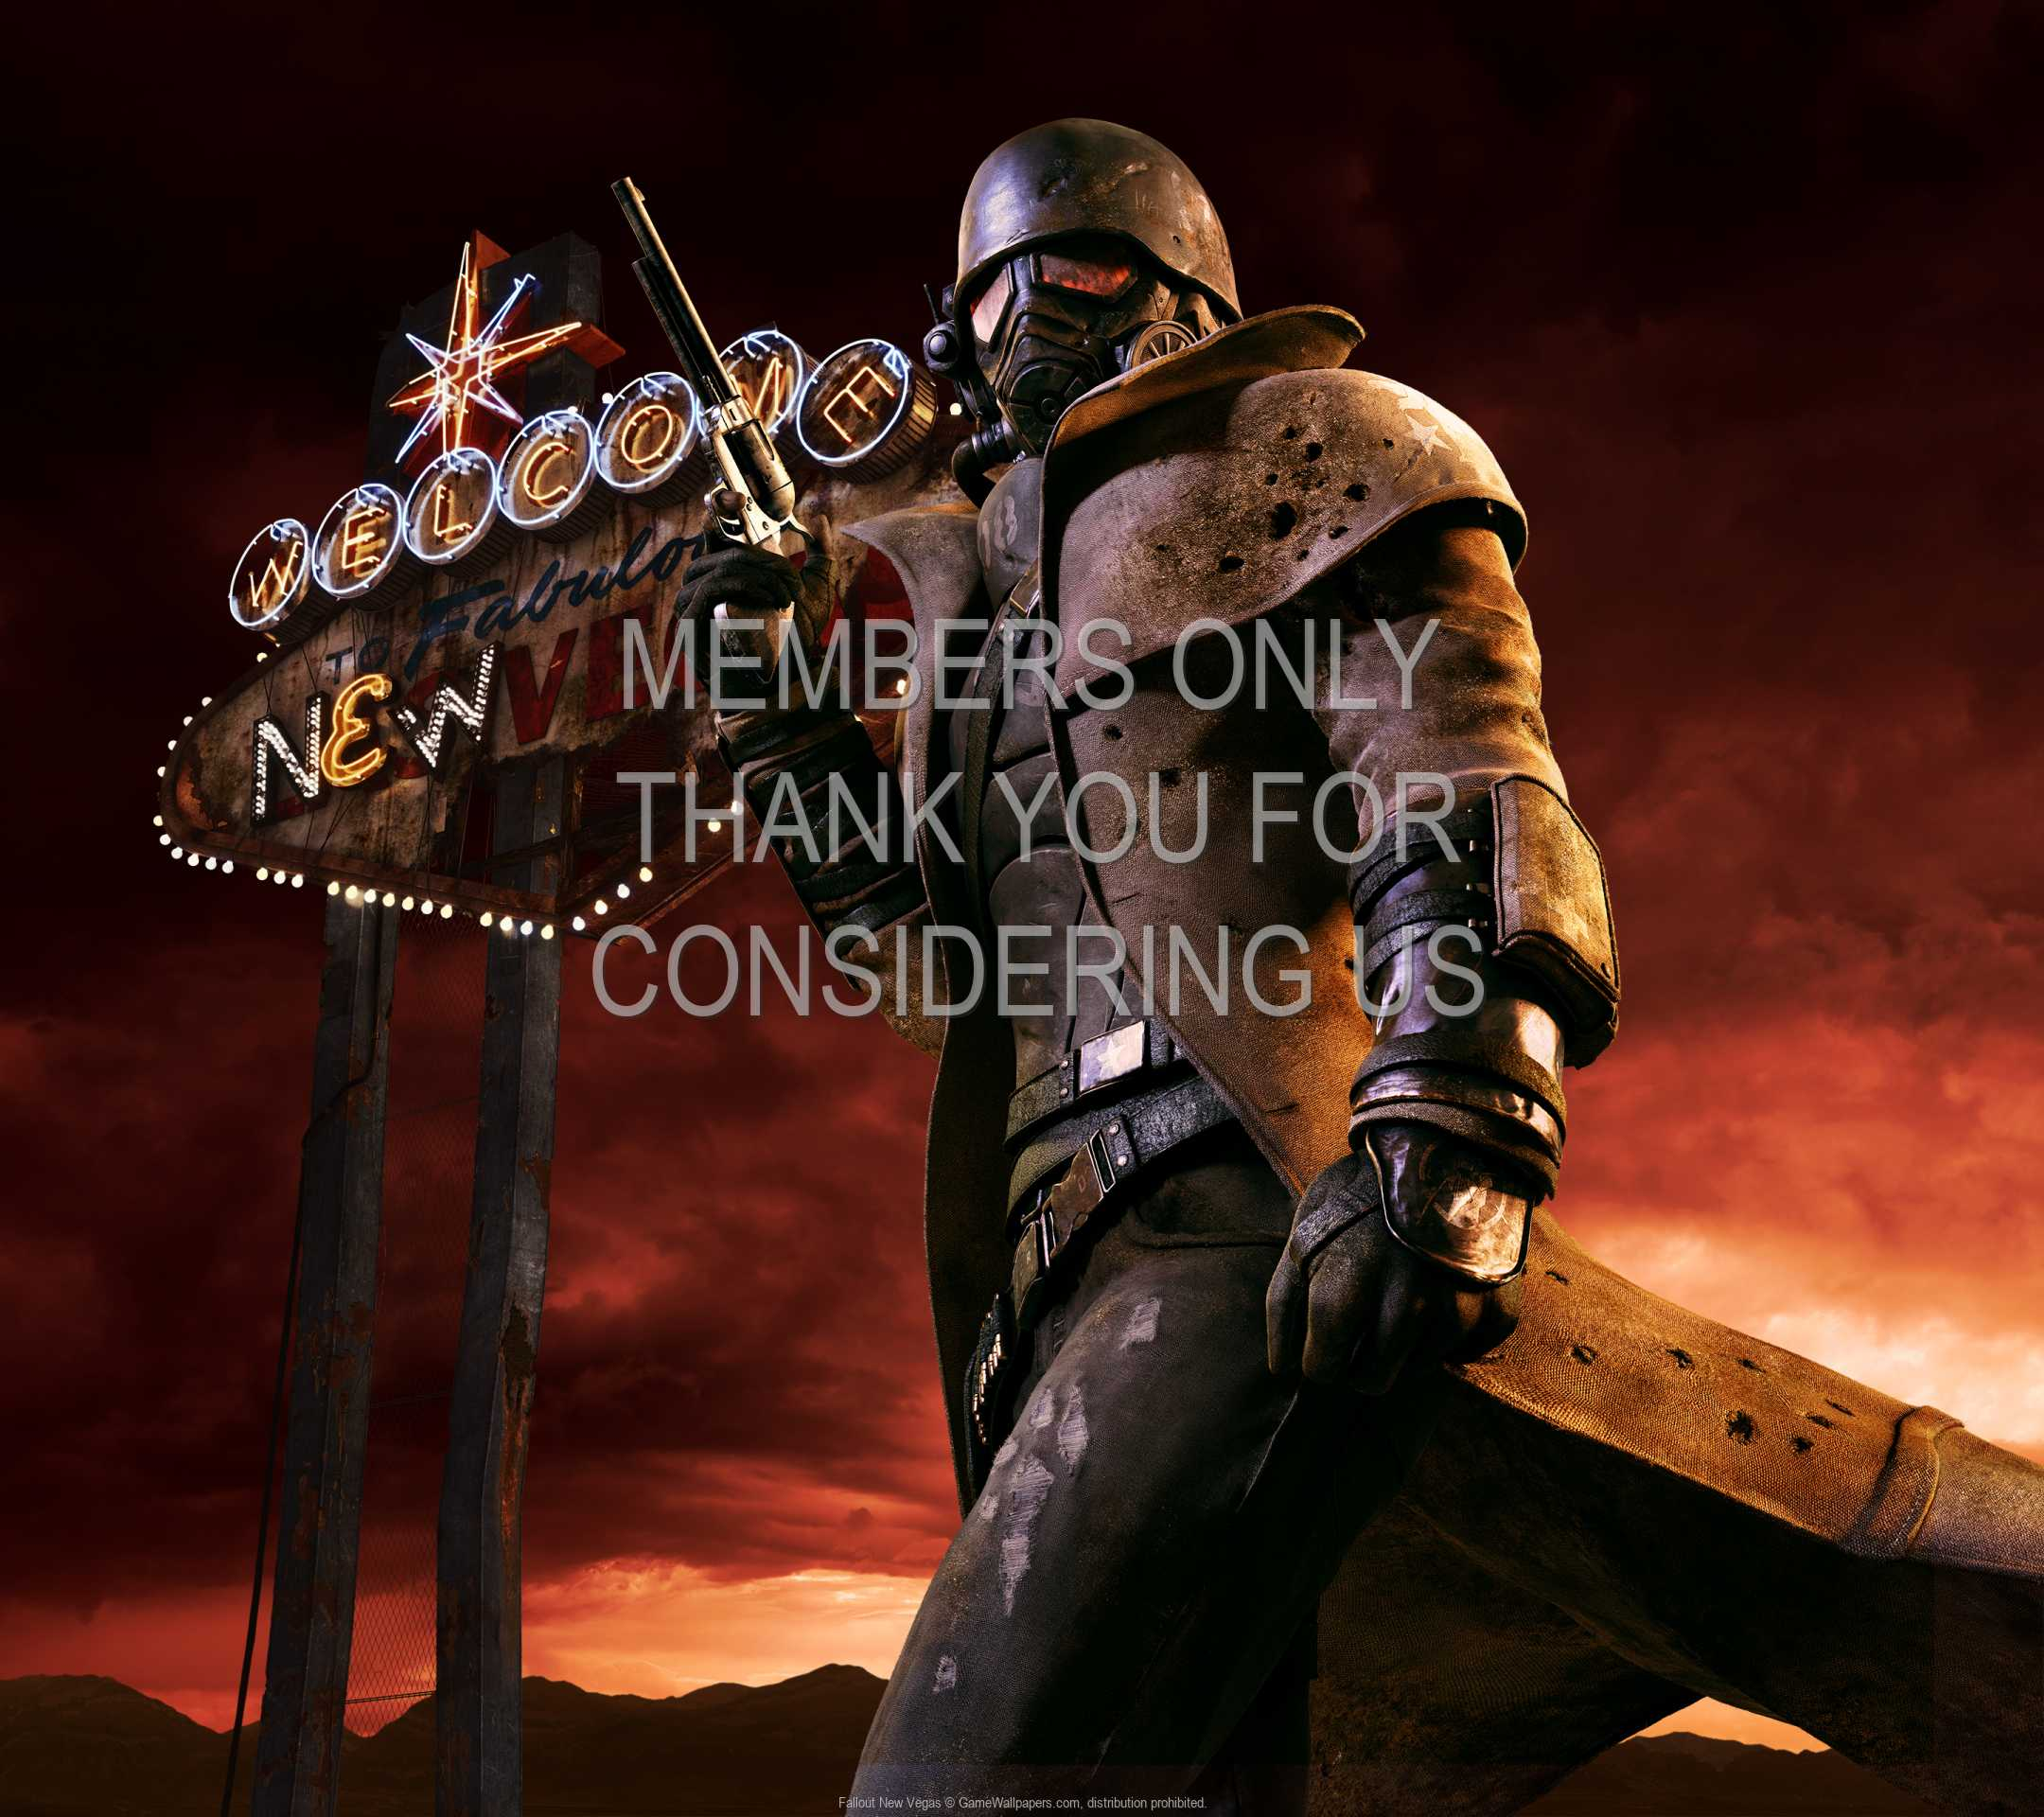 Fallout: New Vegas 1080p Horizontal Mobile wallpaper or background 01